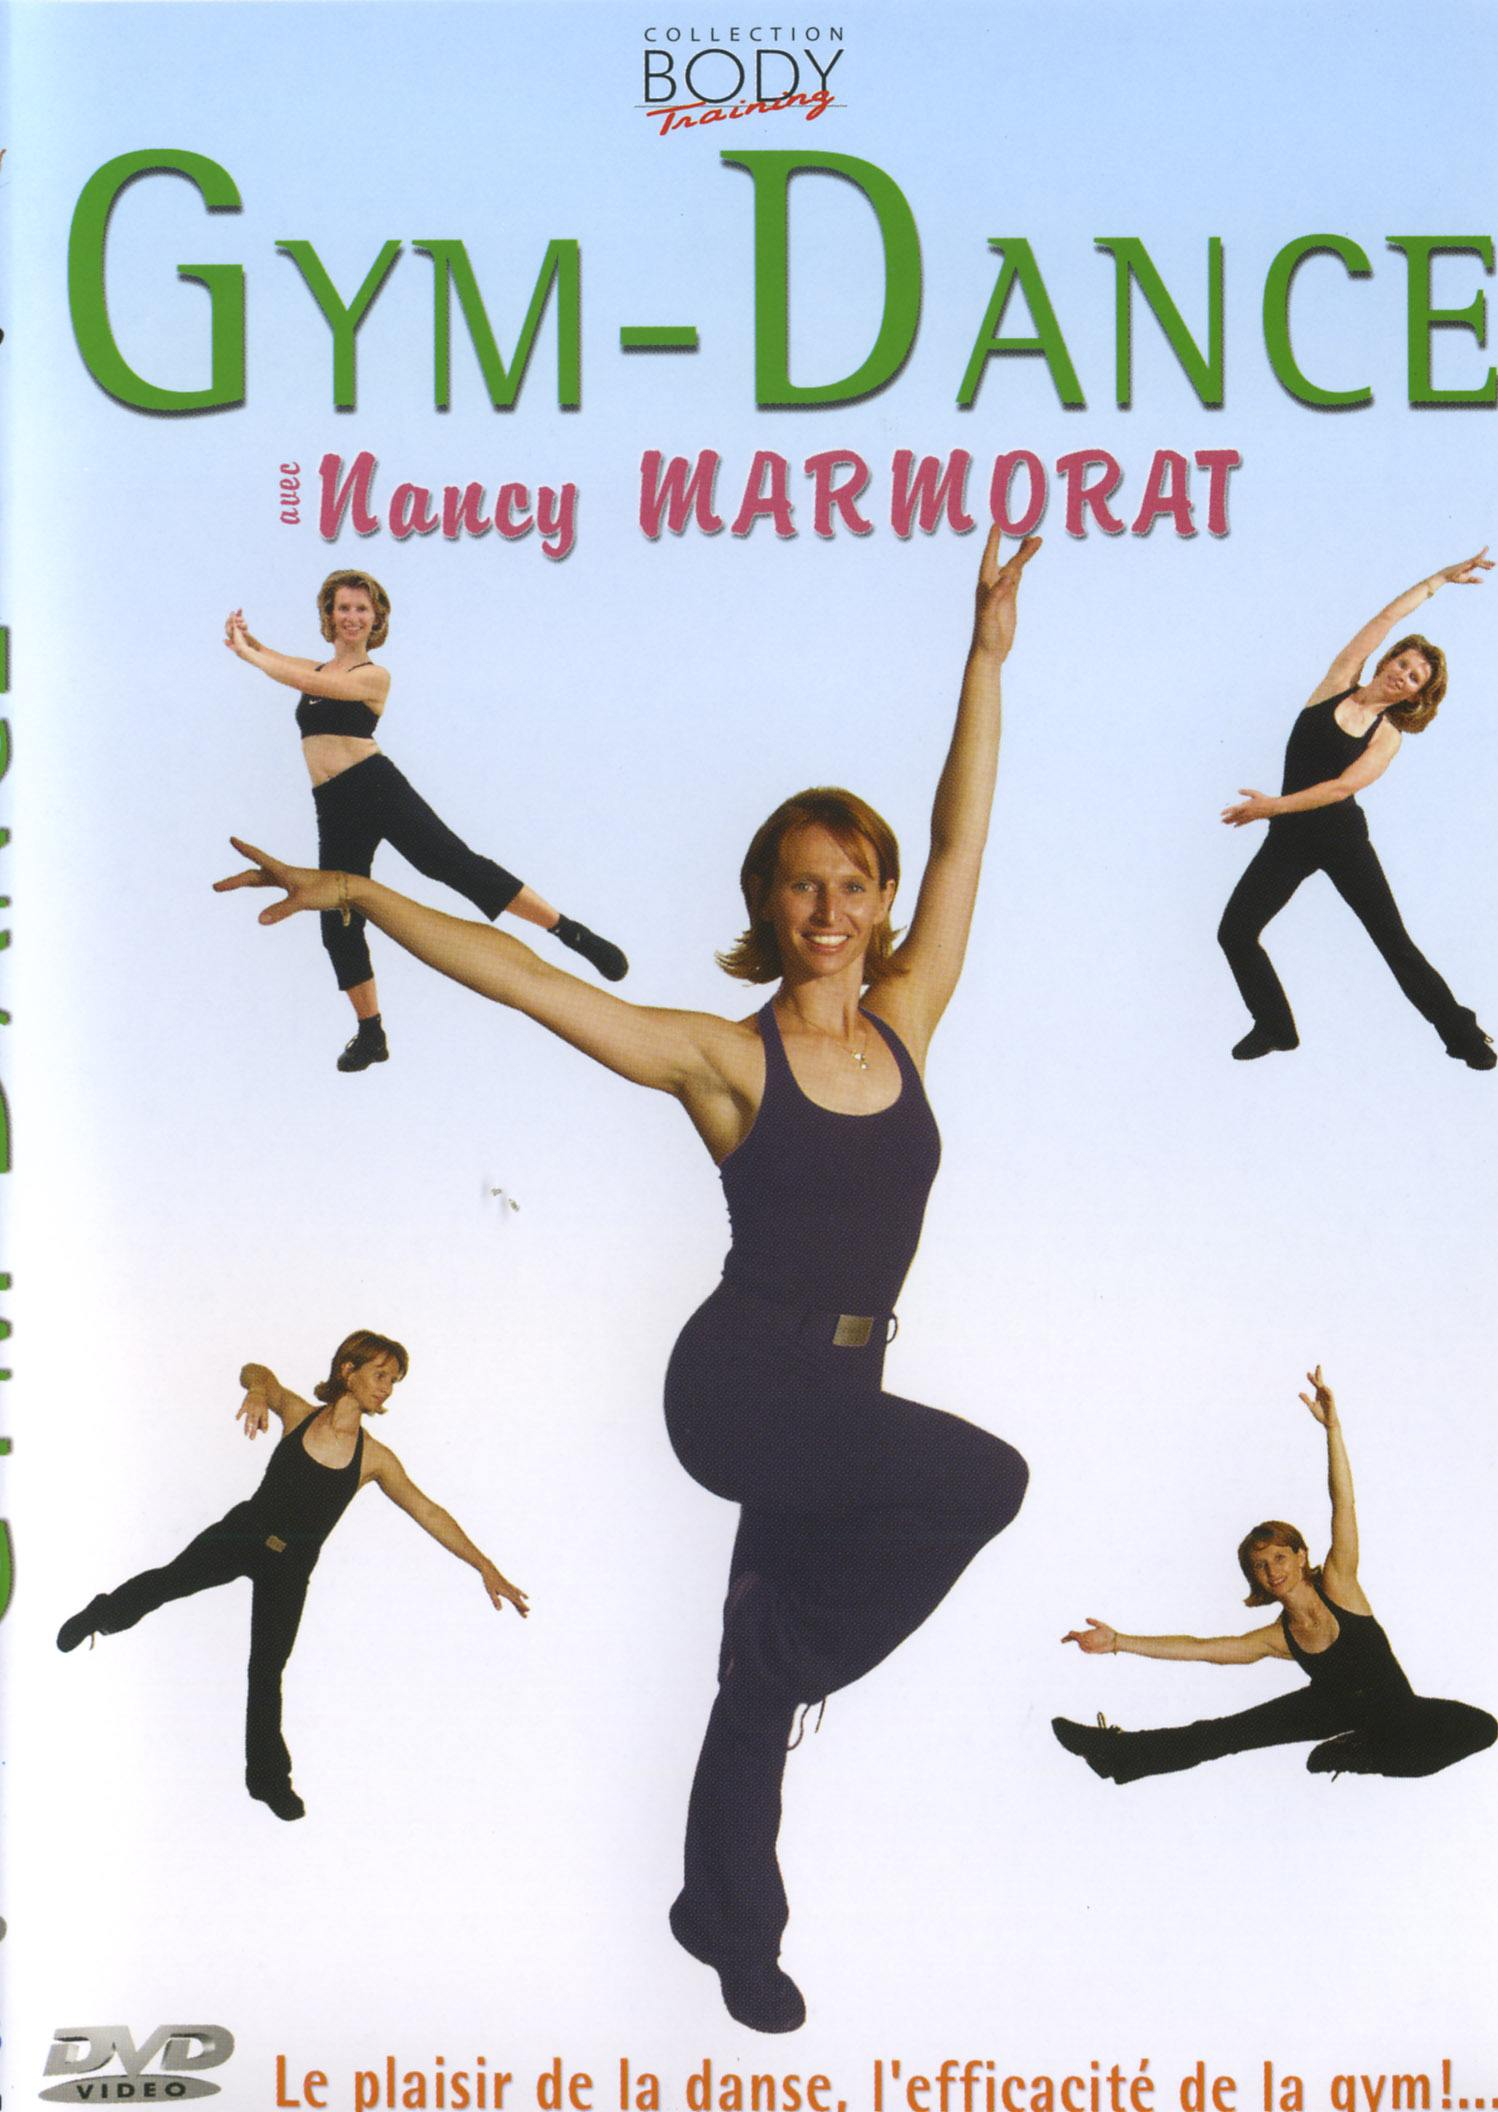 Gym danse - dvd